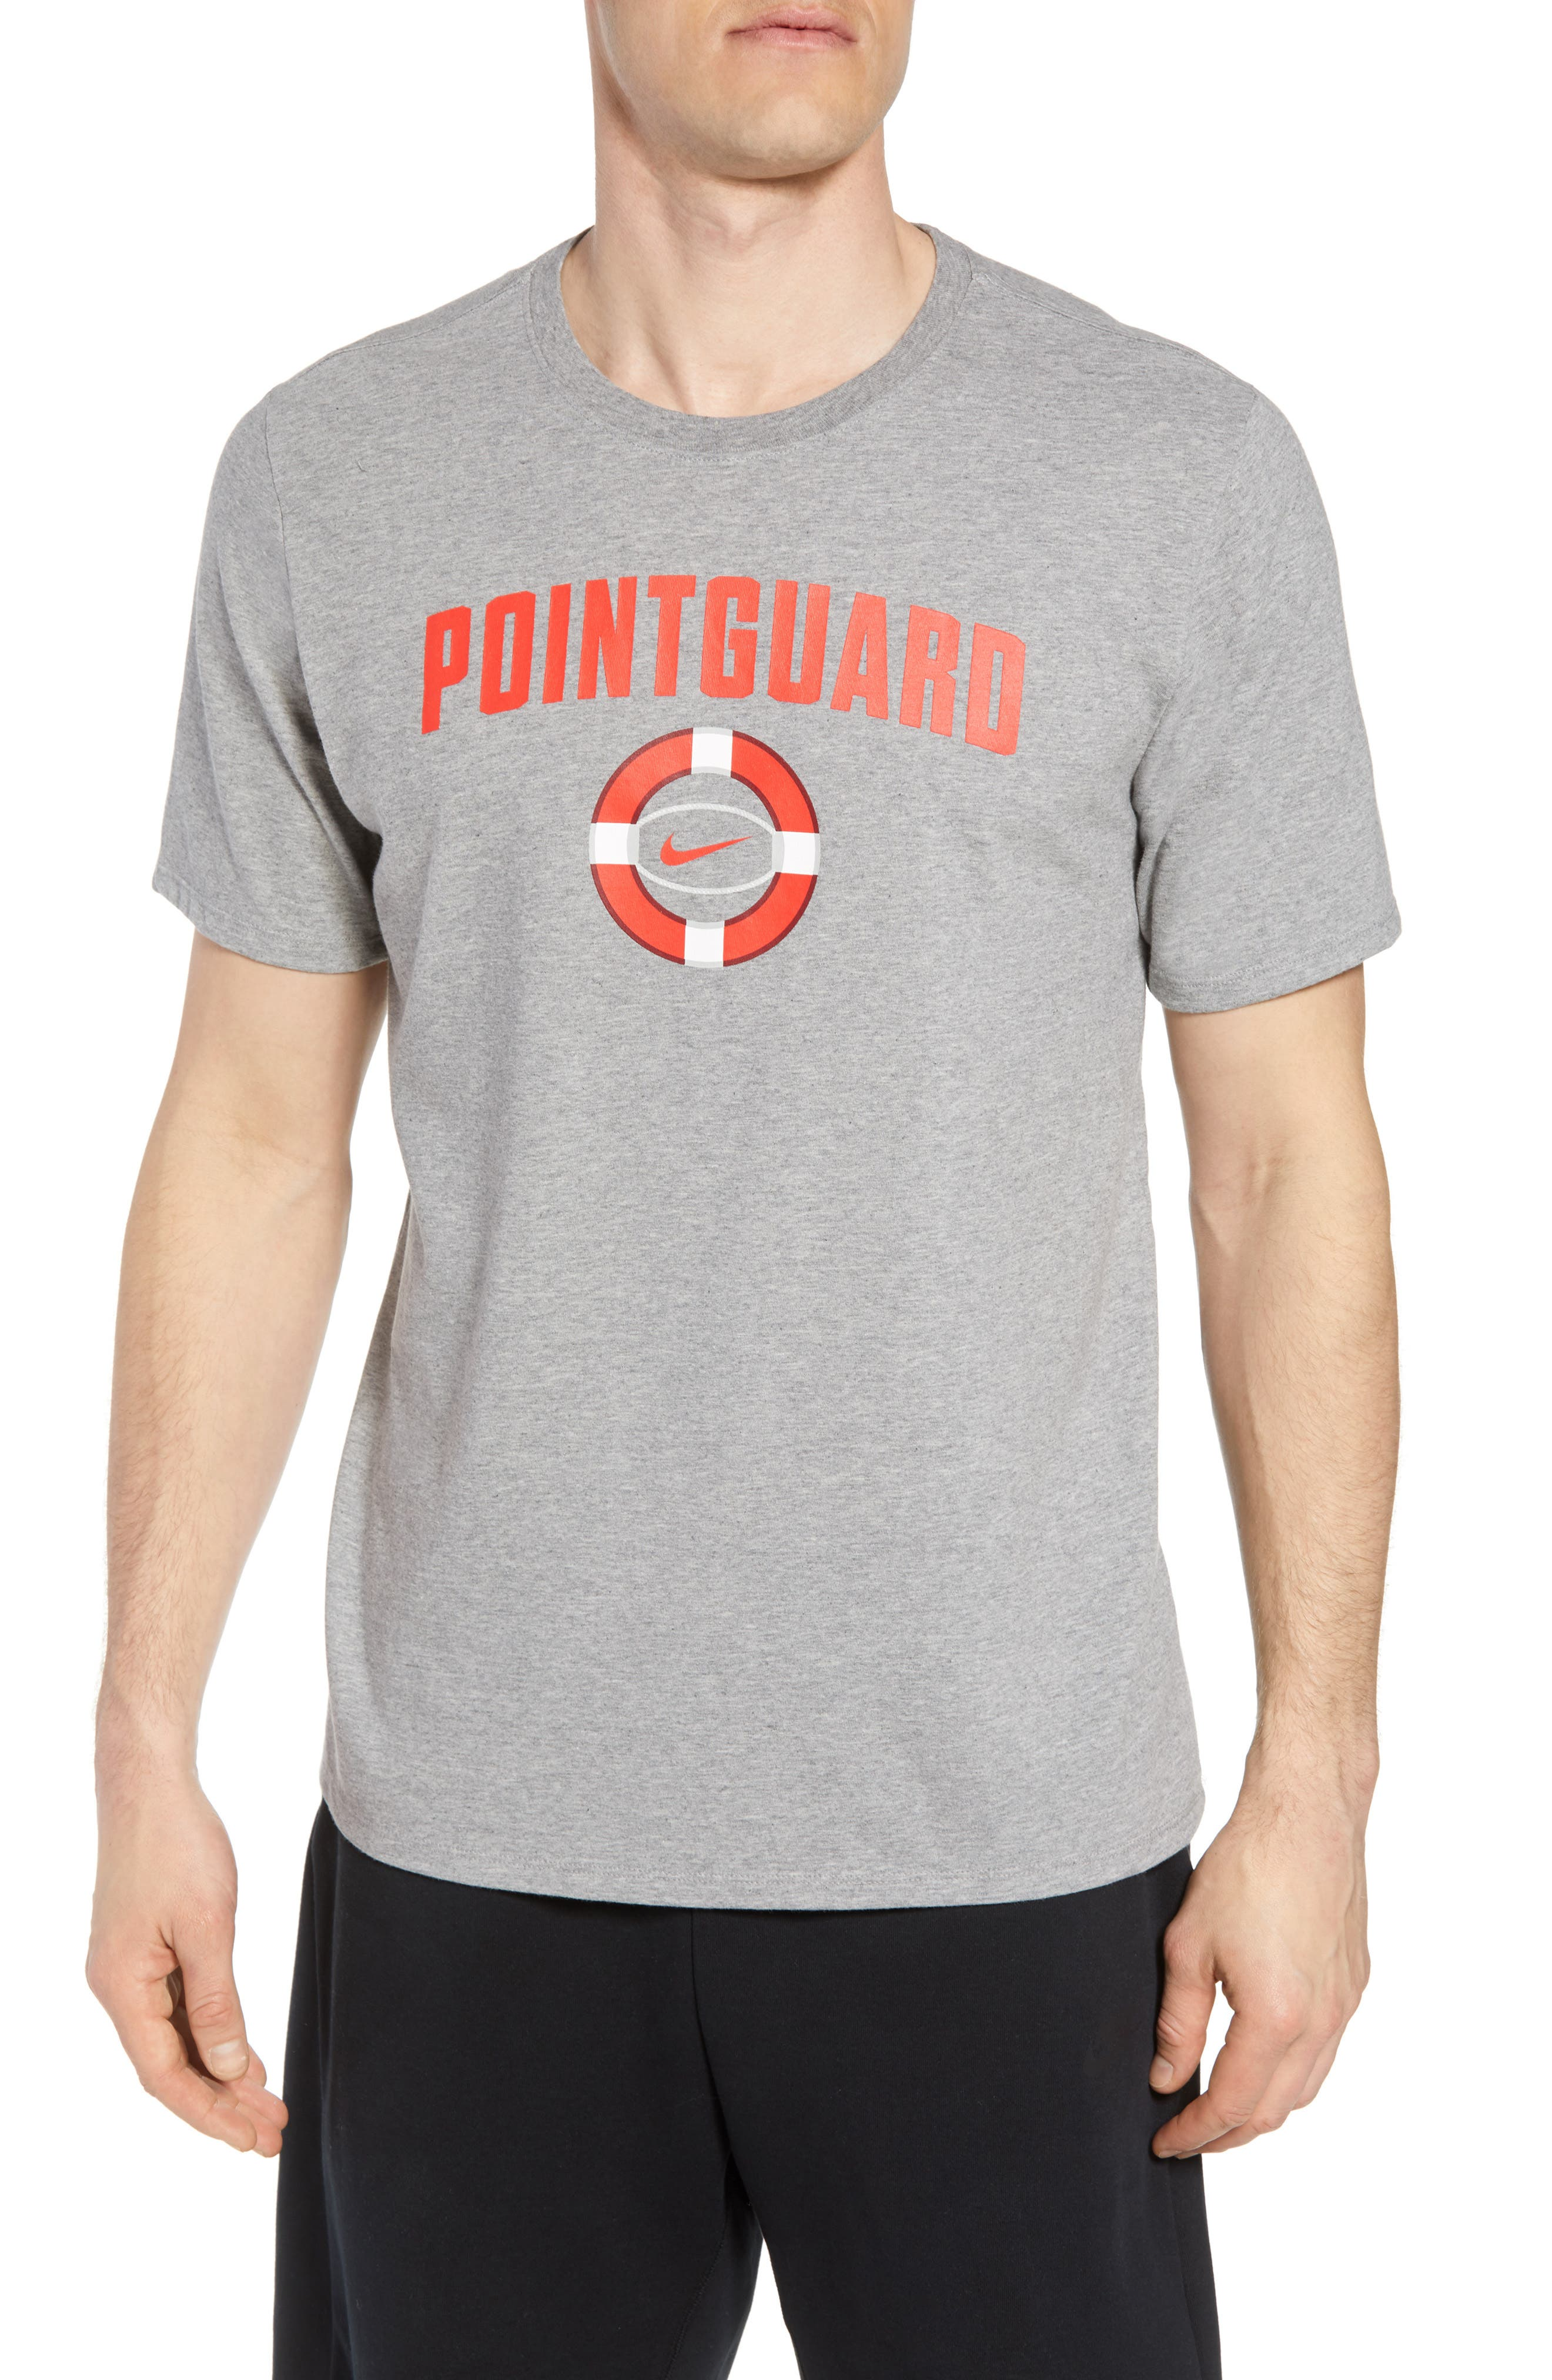 Nike Dry Pointguard Graphic T-Shirt, Grey